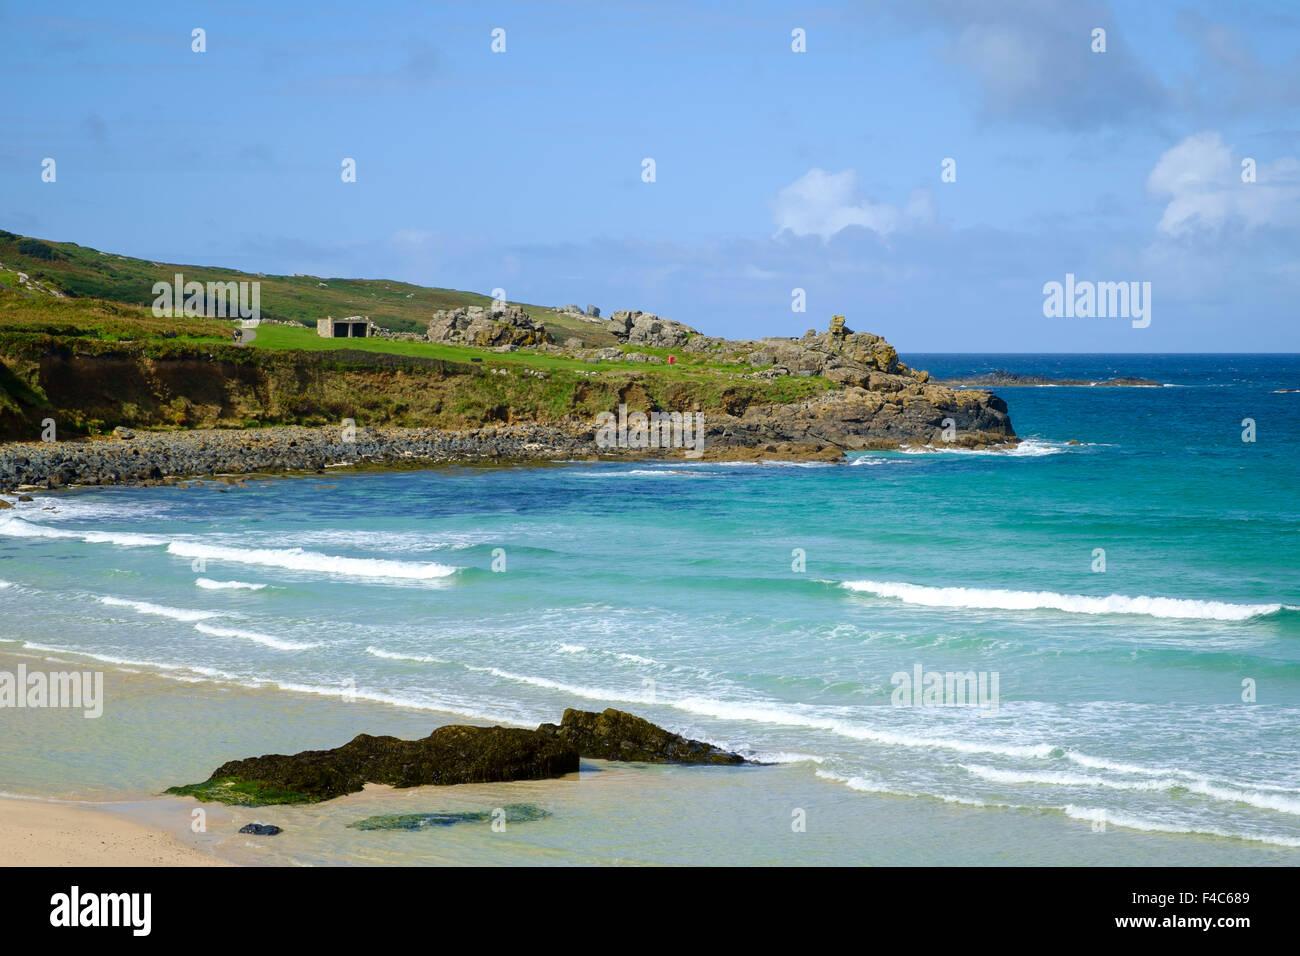 Porthmeor beach, St Ives, Cornwall, England, UK Stock Photo